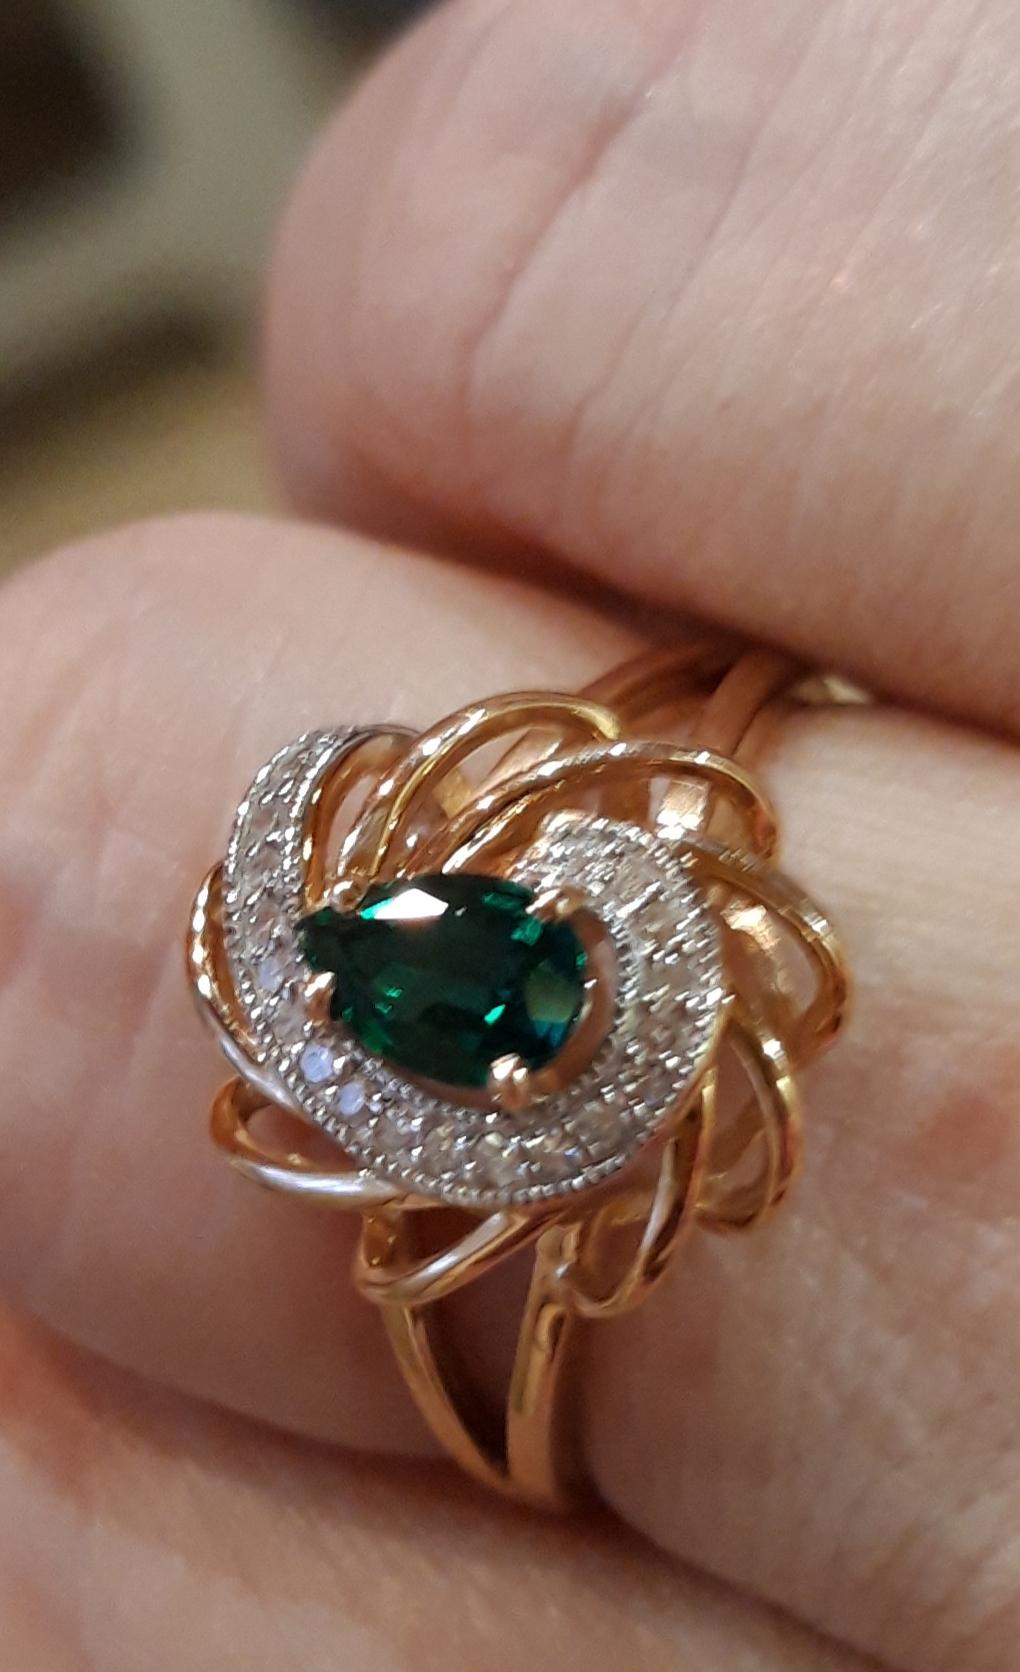 Прекрасное кольцо, смотри тся дорого, красиво, переливаются камушки😊👍